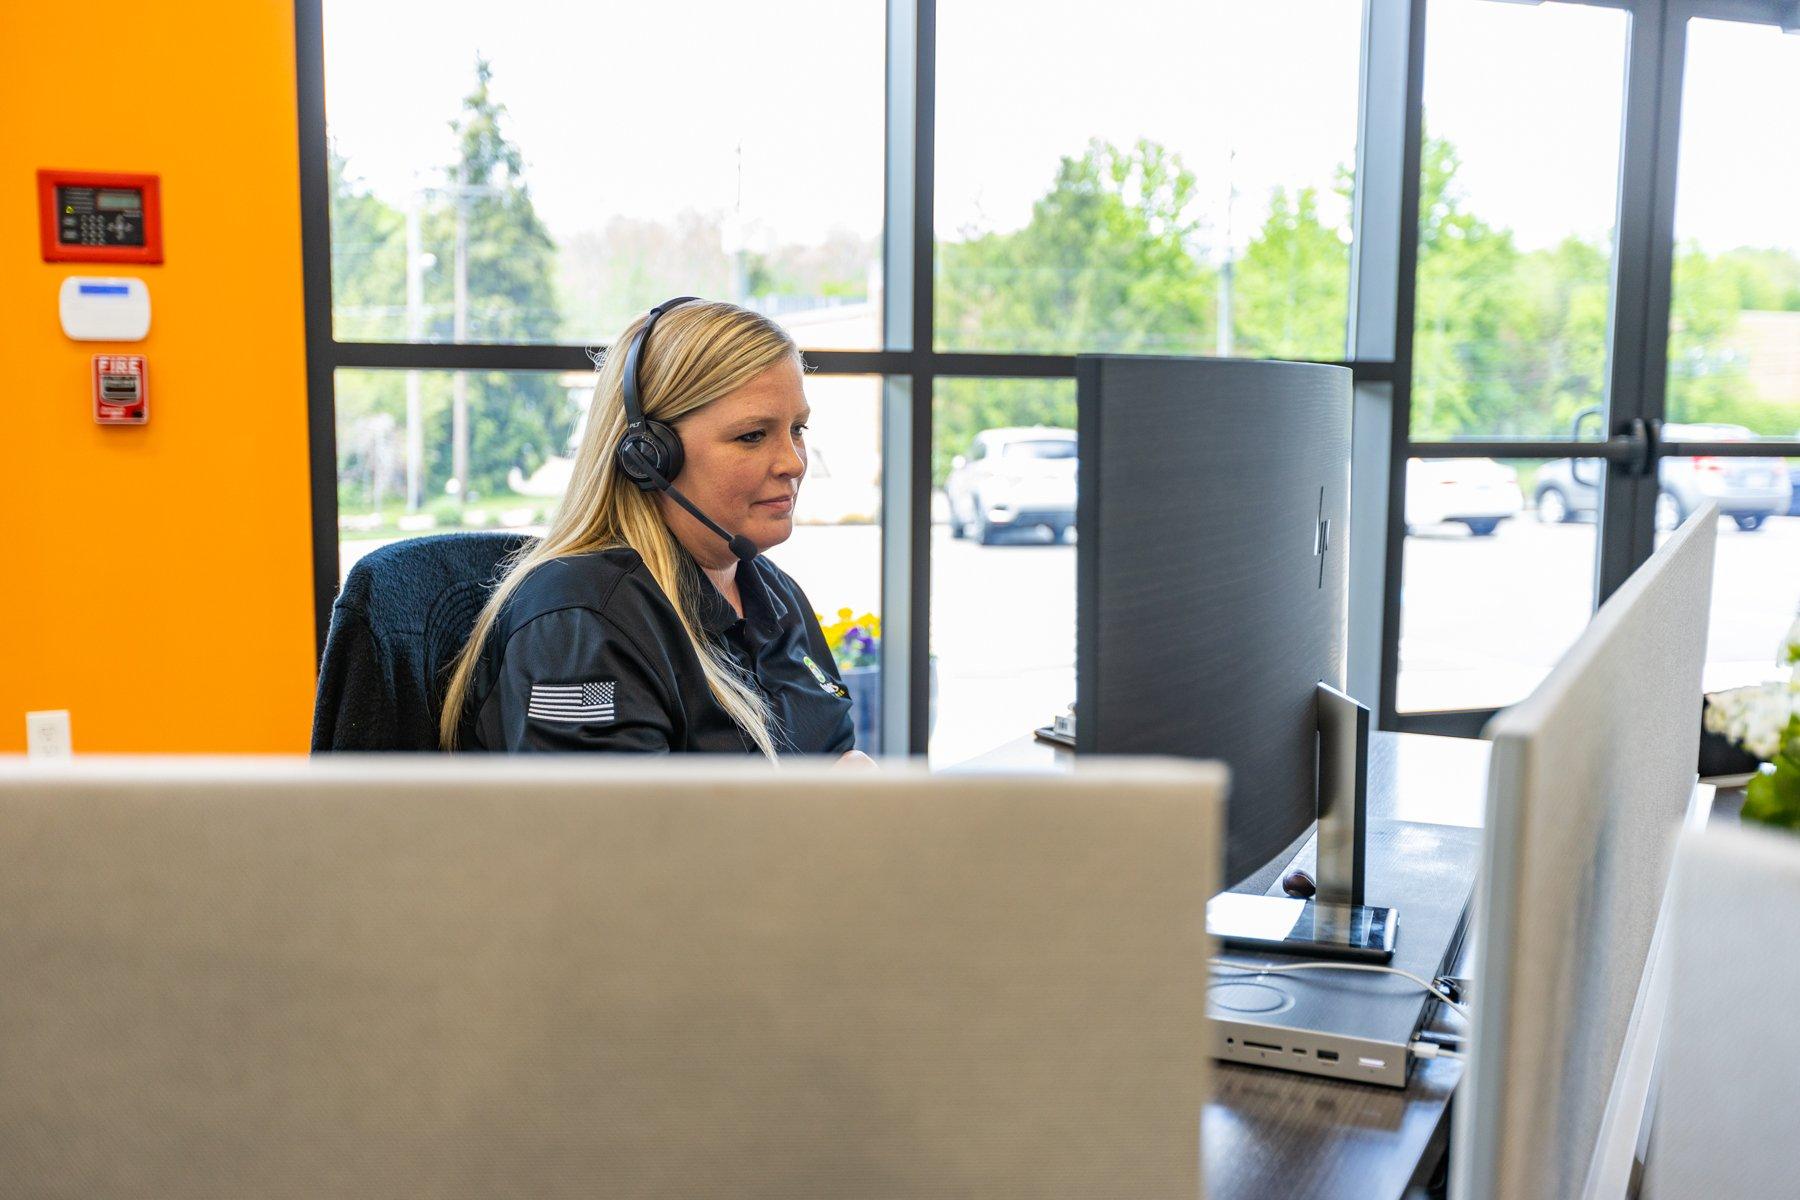 Danielle Whalen working in customer service